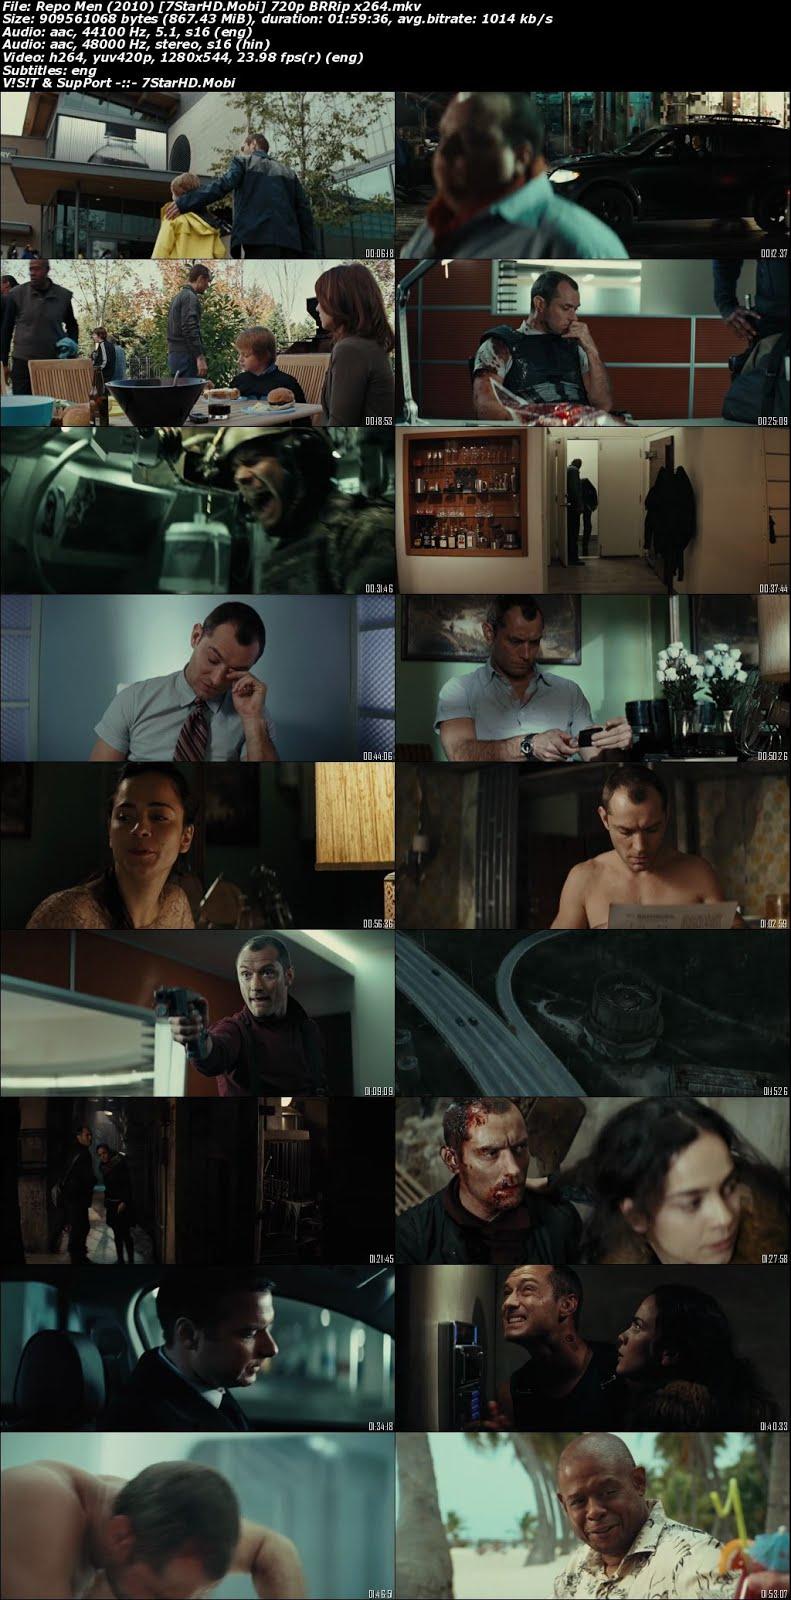 Repo Men (2010) Dual Audio 720p BluRay x264 [Hindi + English] ESubs 2